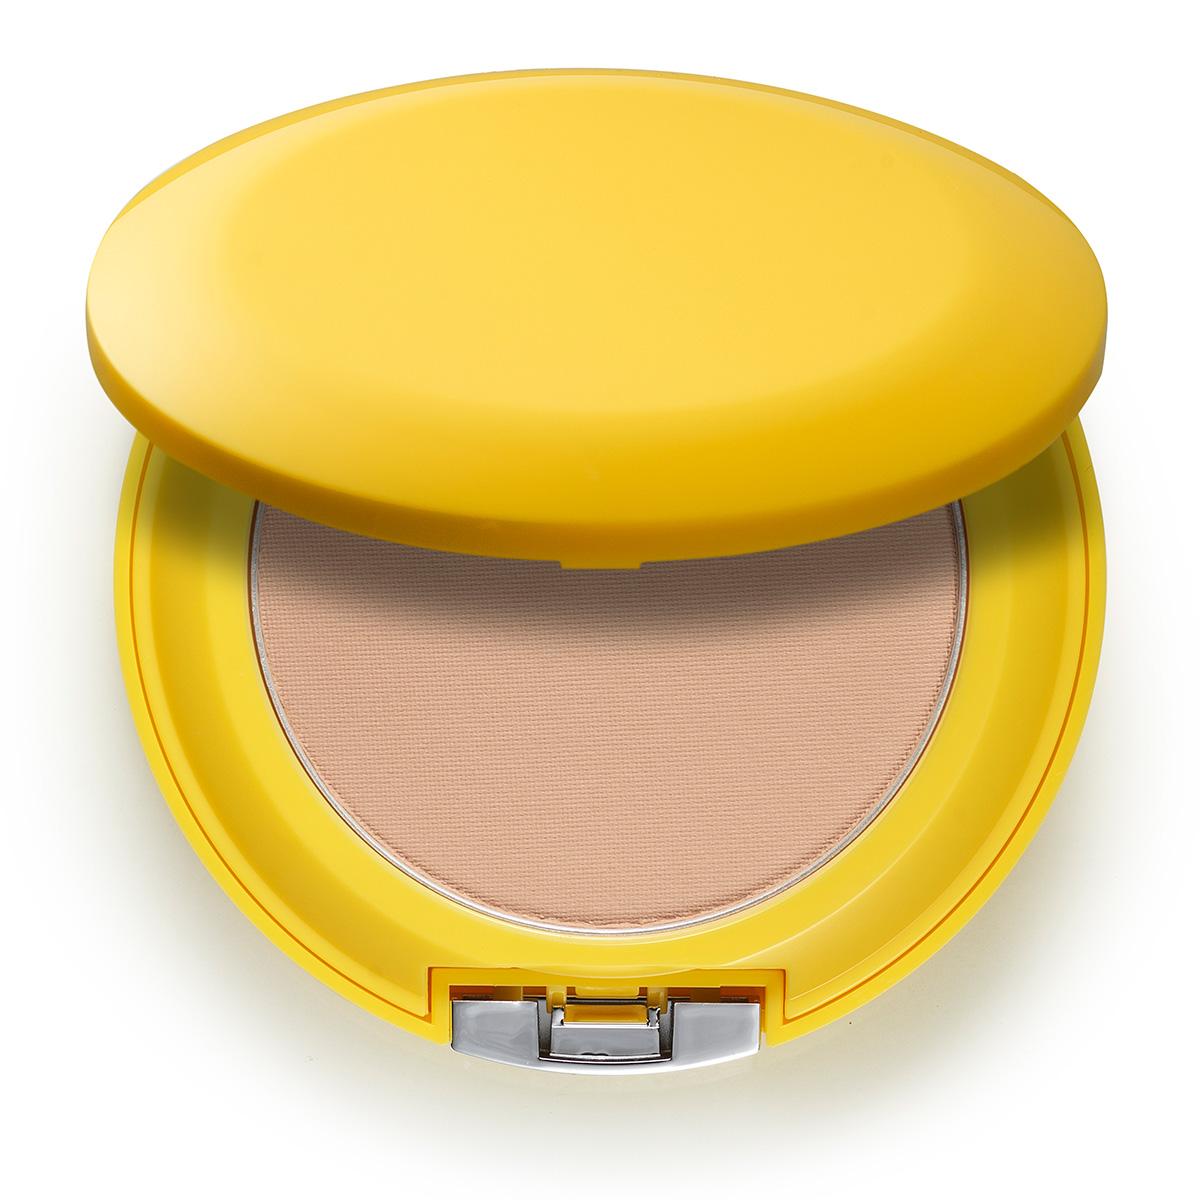 Image of   Clinique Sun SPF 30 Mineral Powder Makeup